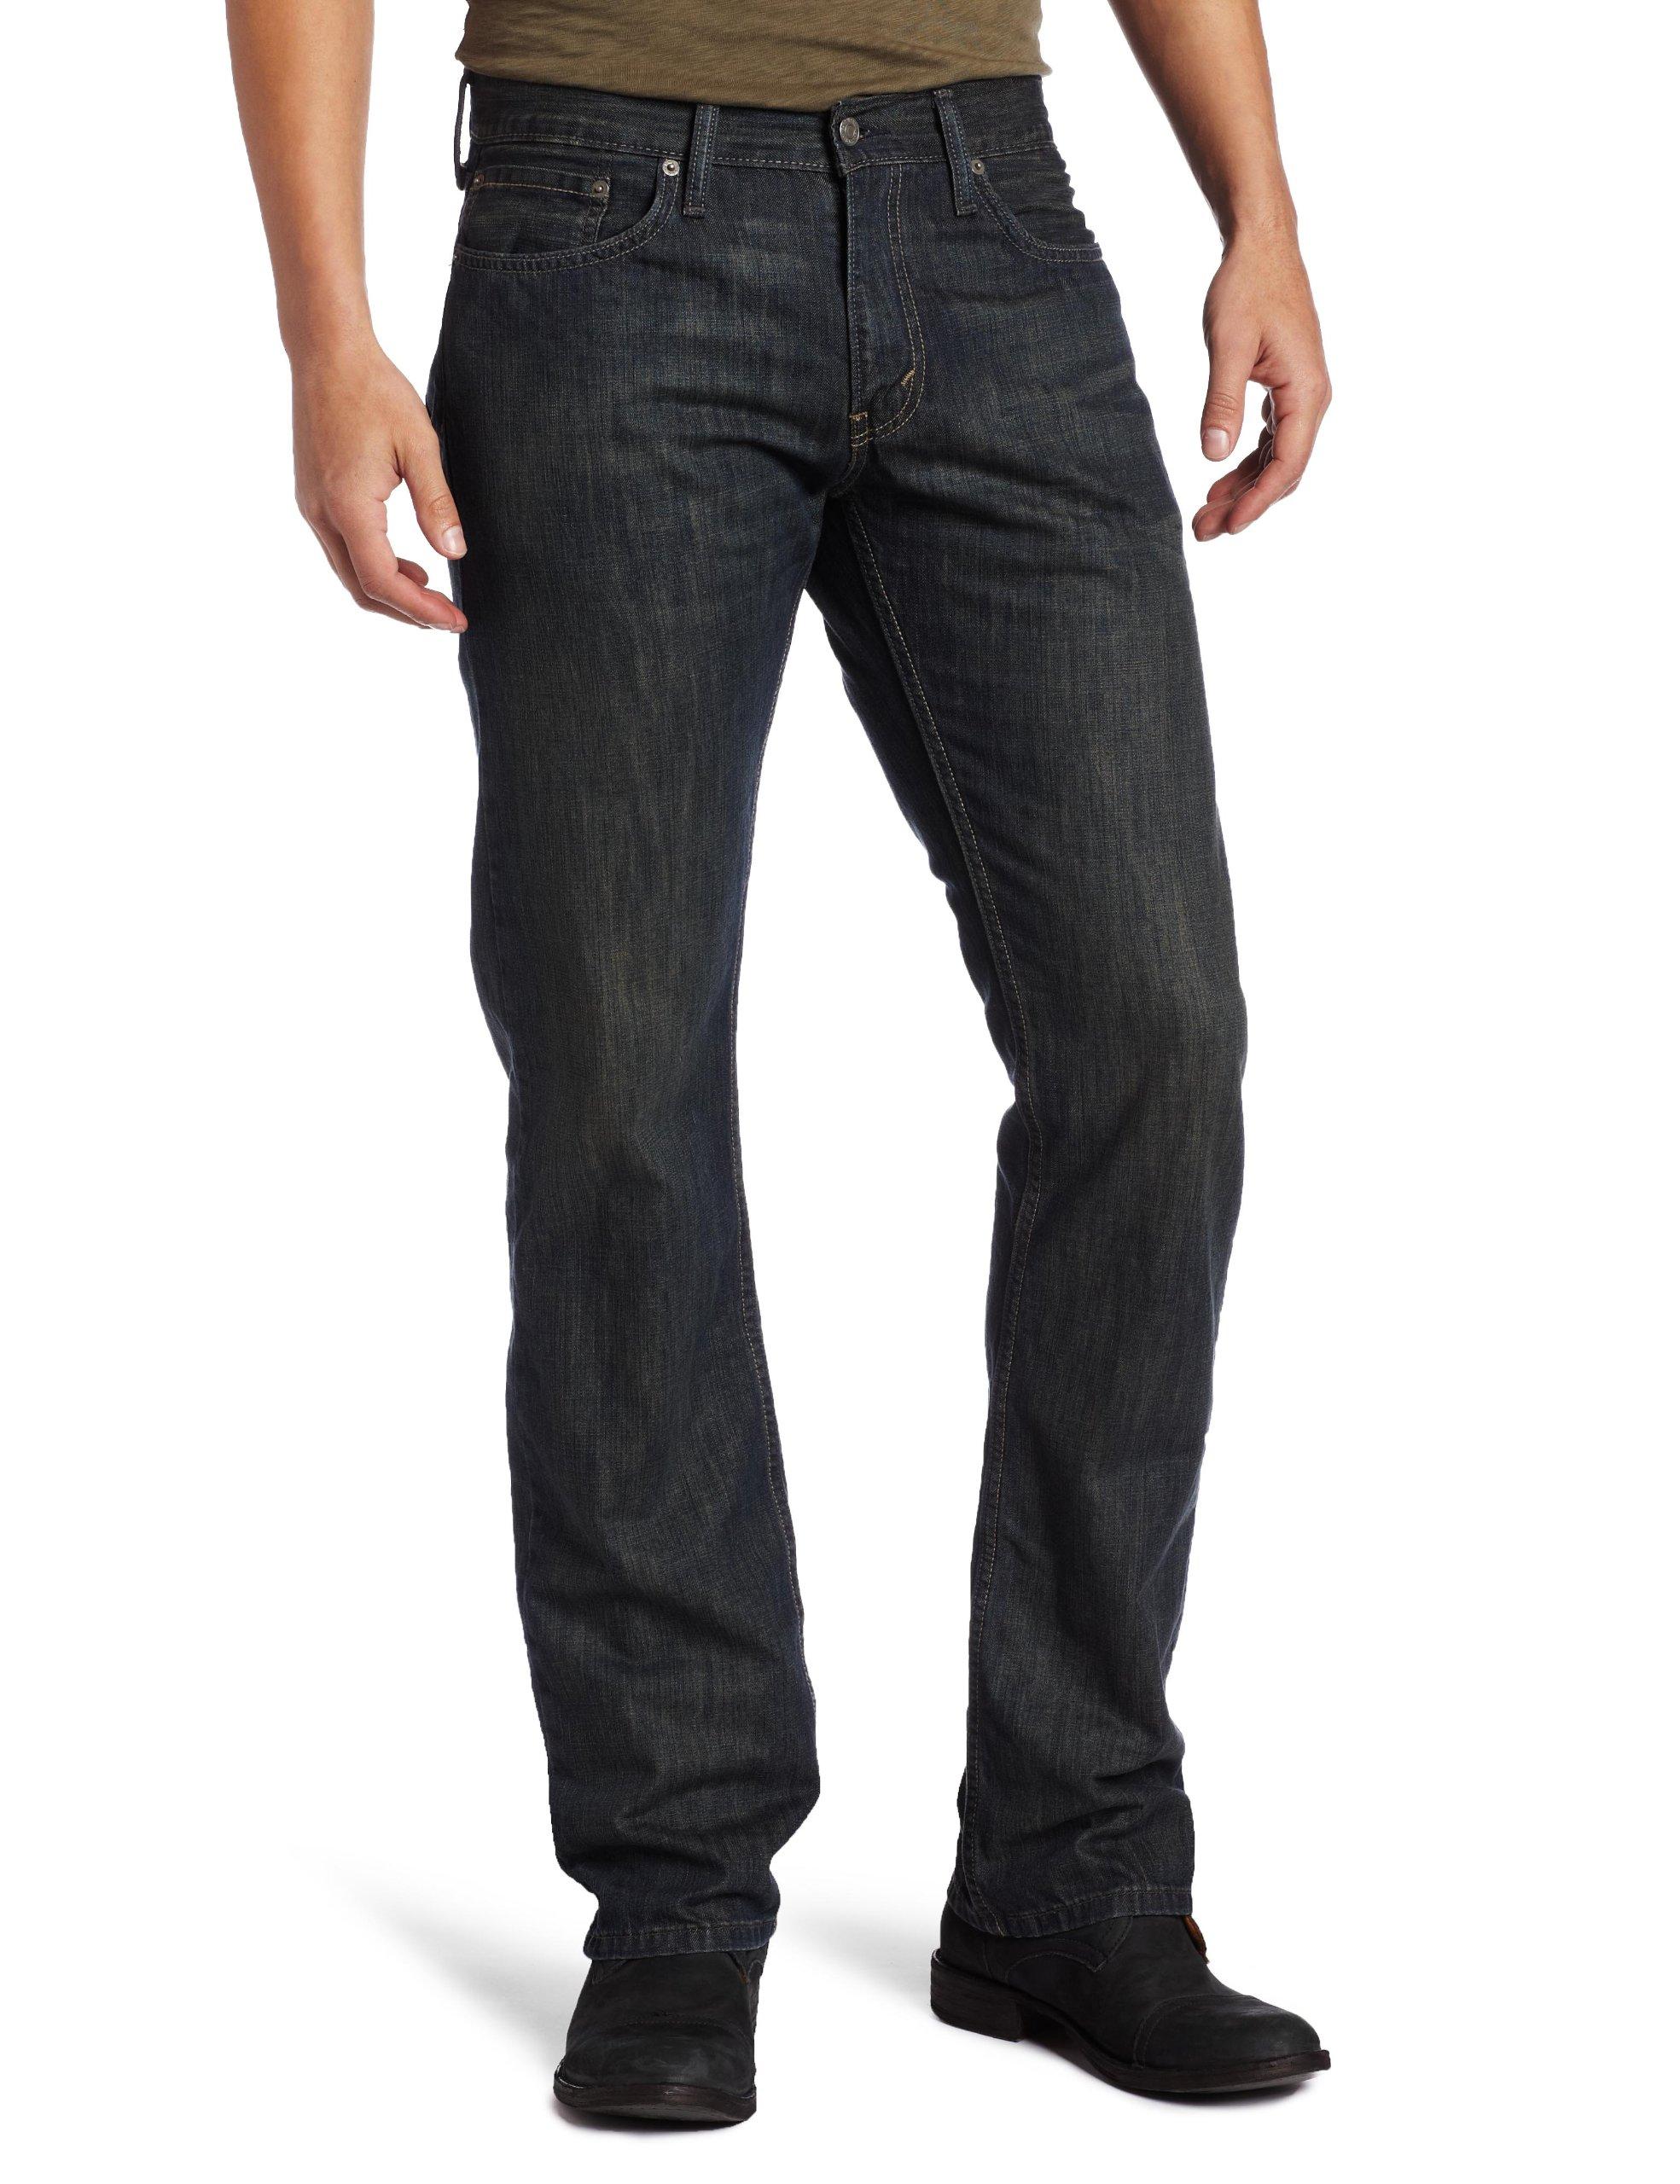 Levi's Men's 514 Straight fit Stretch Jean, Dirt Rush, 32x30